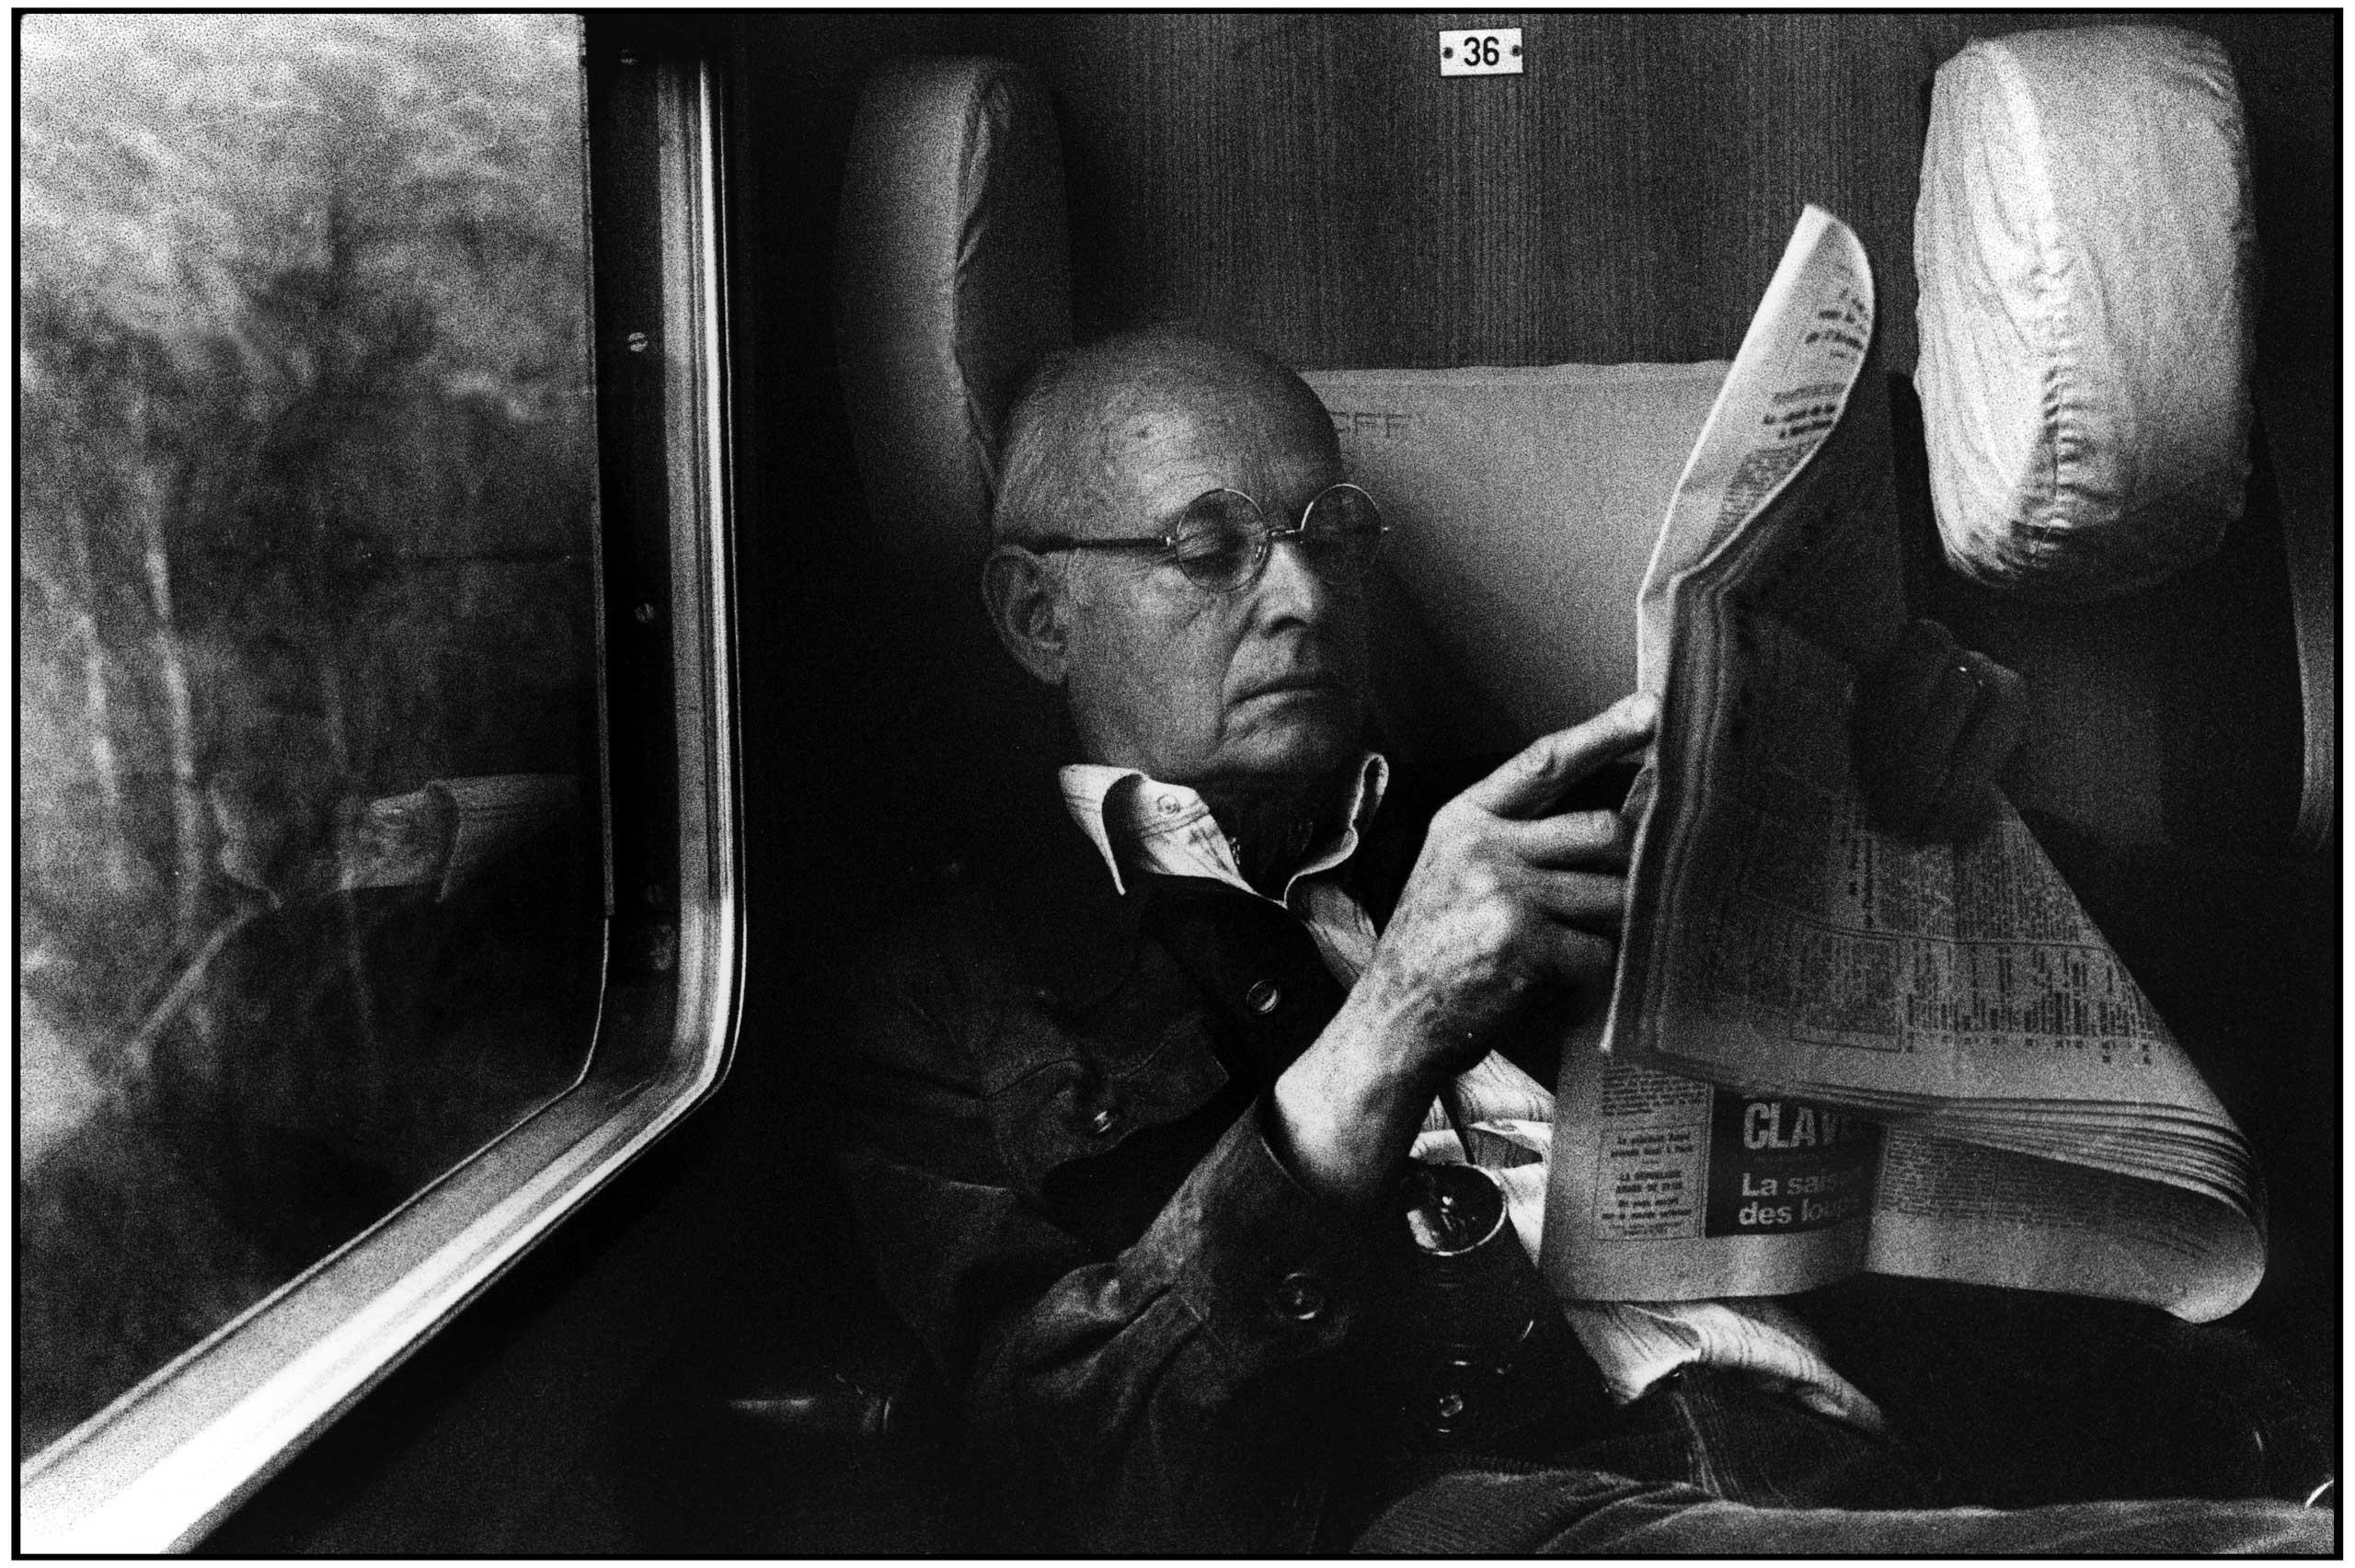 Henri Cartier-Bresson on a train ride to Montreaux in Switzerland, 1976.